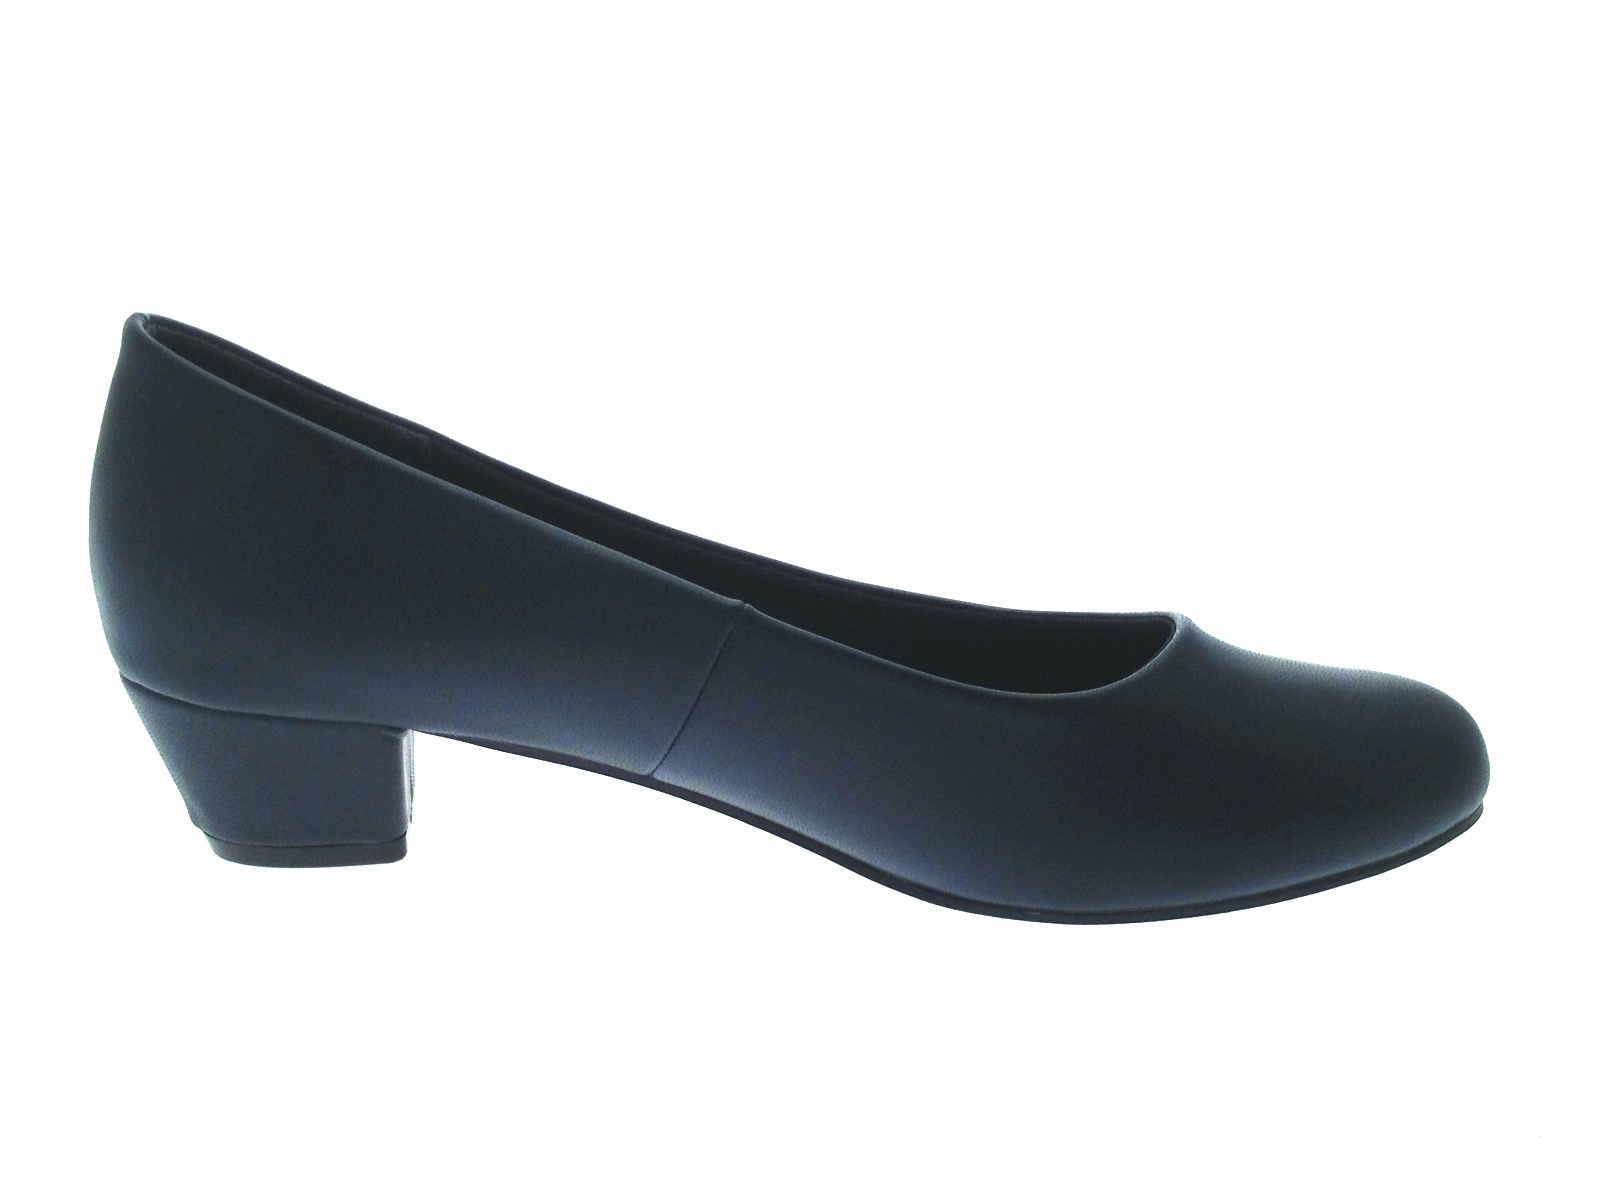 Womens Low Block Heels Comfort Work Office Loafer Court Shoes Ladies Size UK 3-8 | EBay